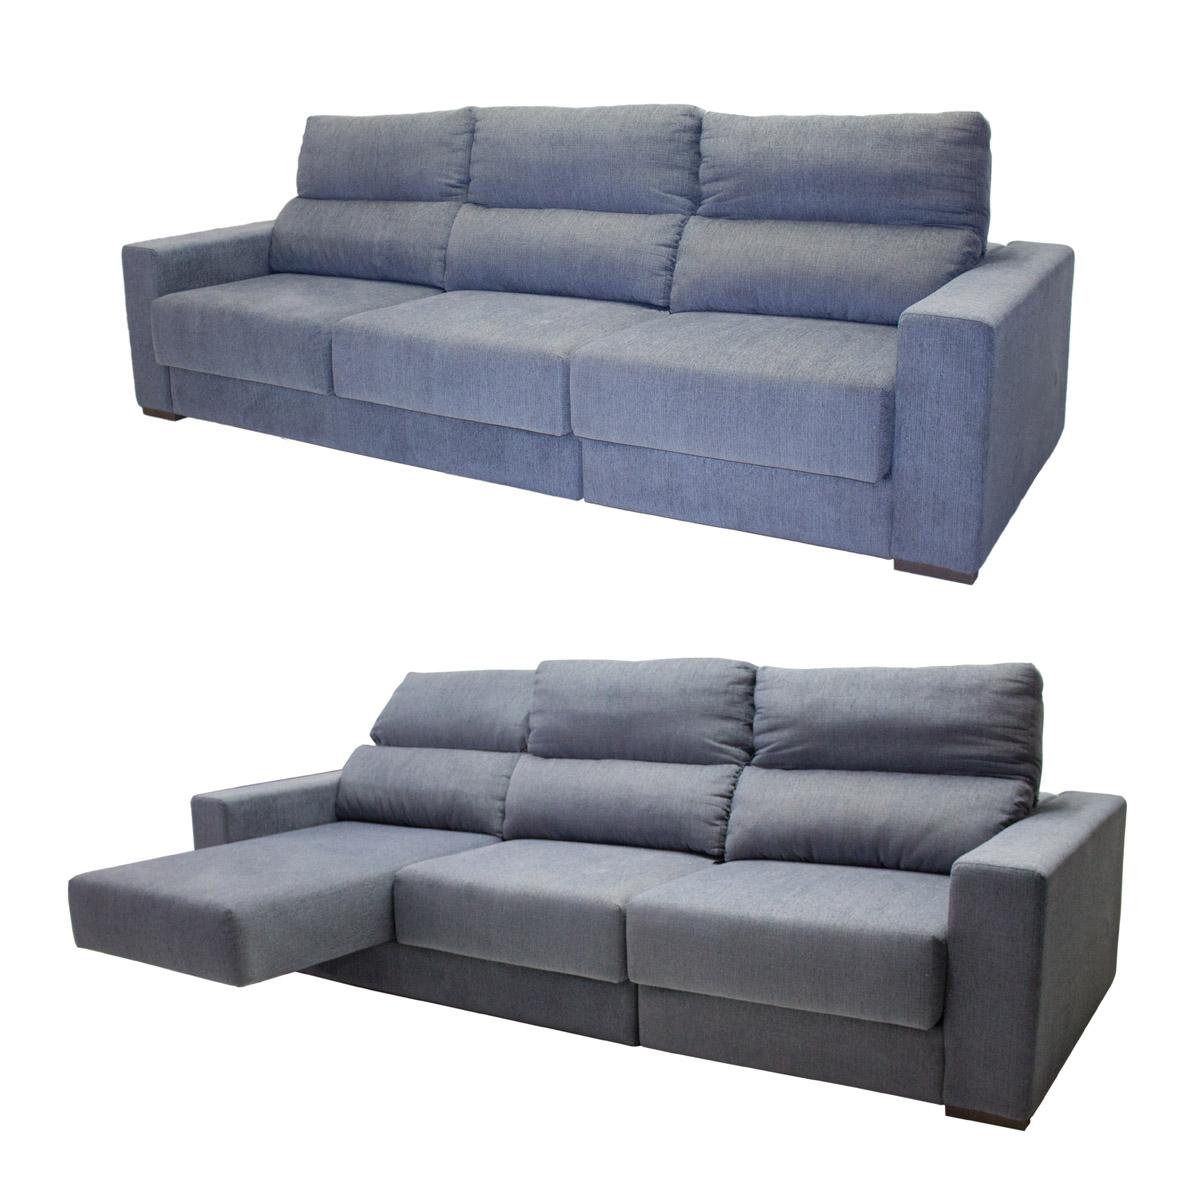 Sofá 7900 (Top) -  Retrátil e reclinável(C)